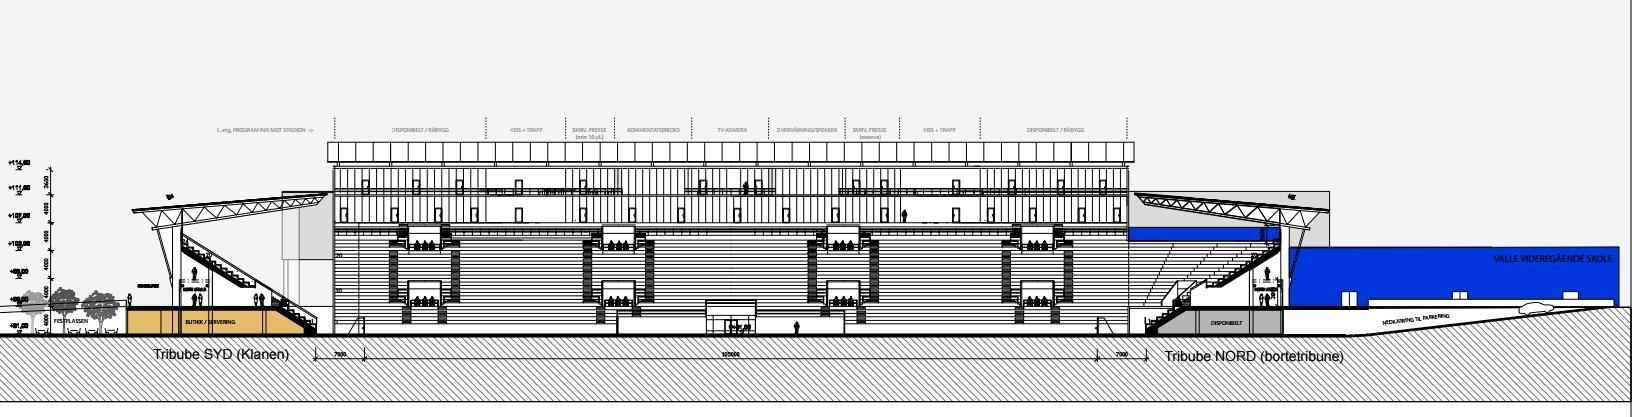 Tribune Syd Vålerenga Stadion